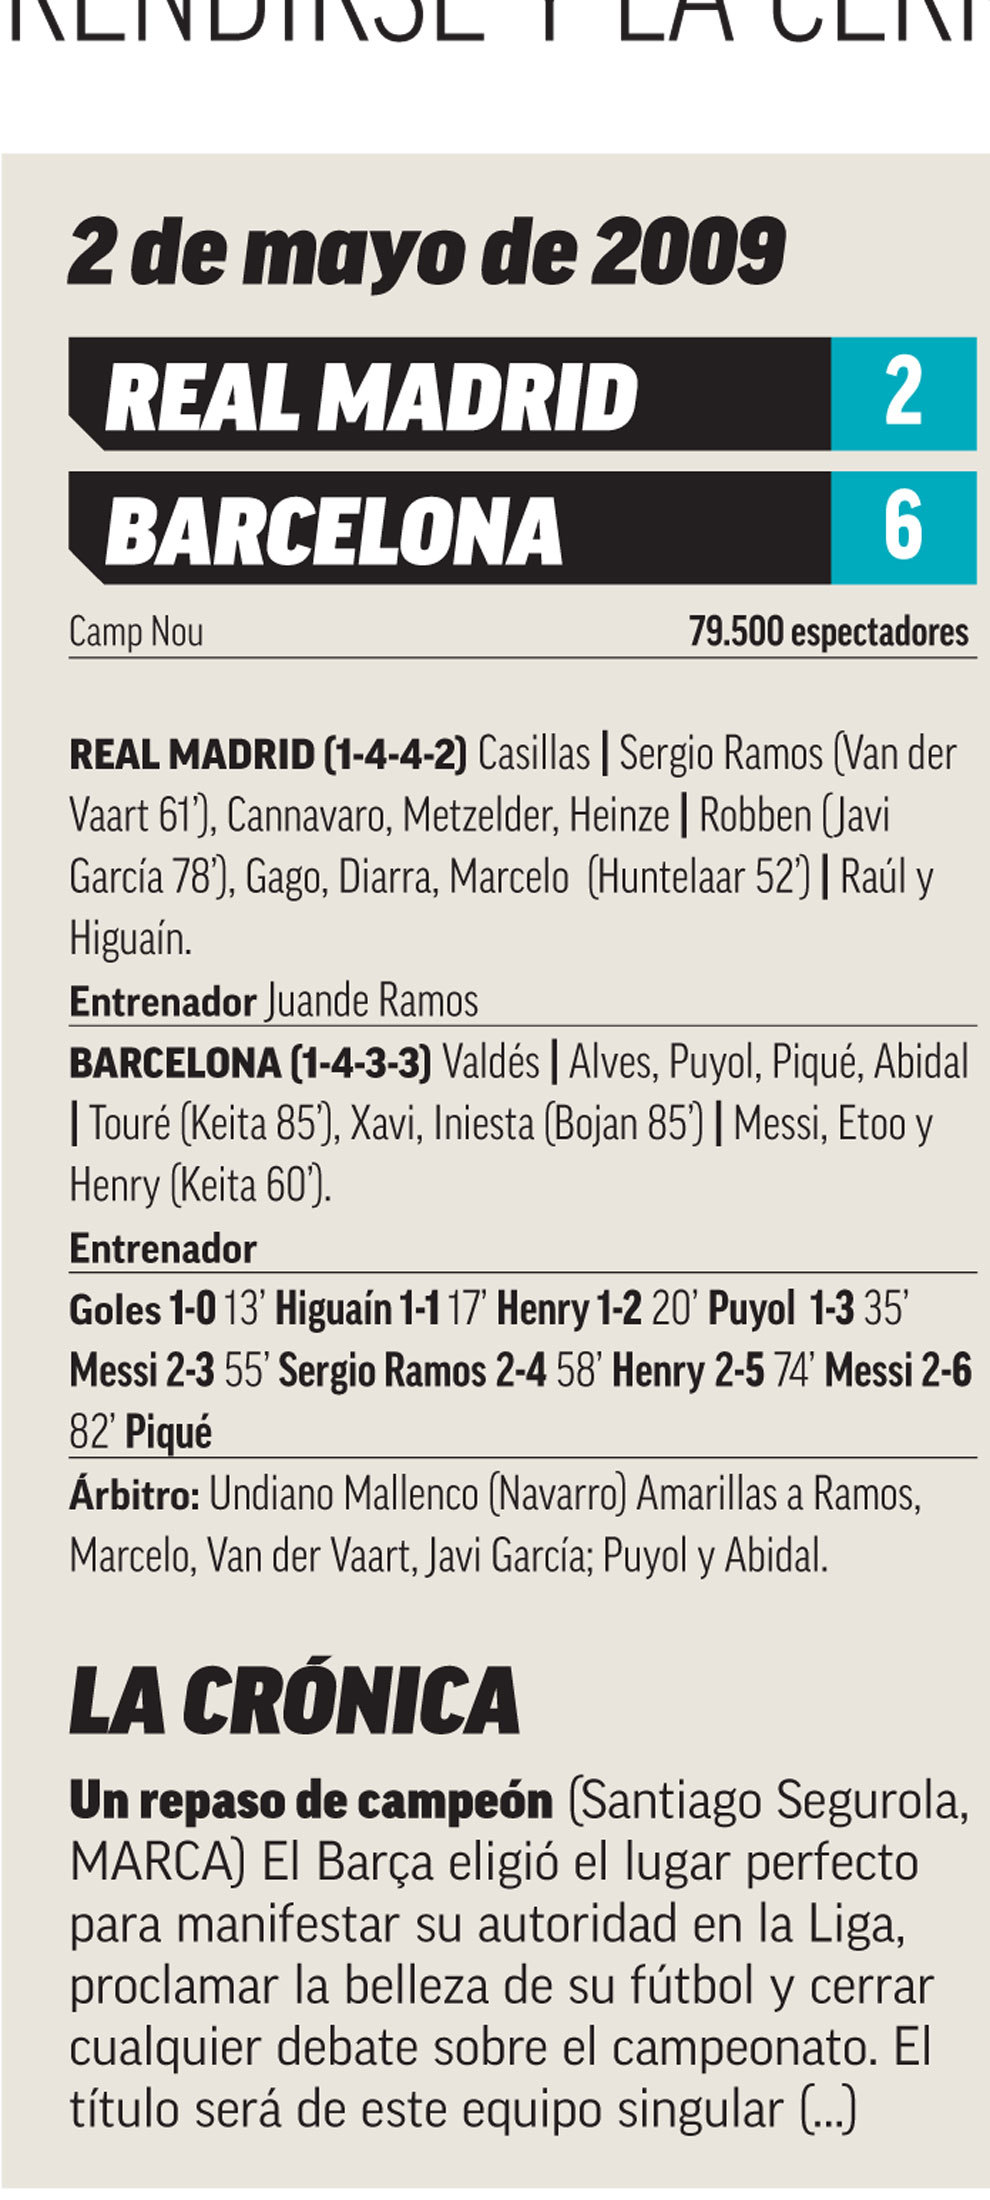 Laliga Santander Barcelona S 6 2 Win Over Real Madrid Guardiola S Masterpiece Marca In English